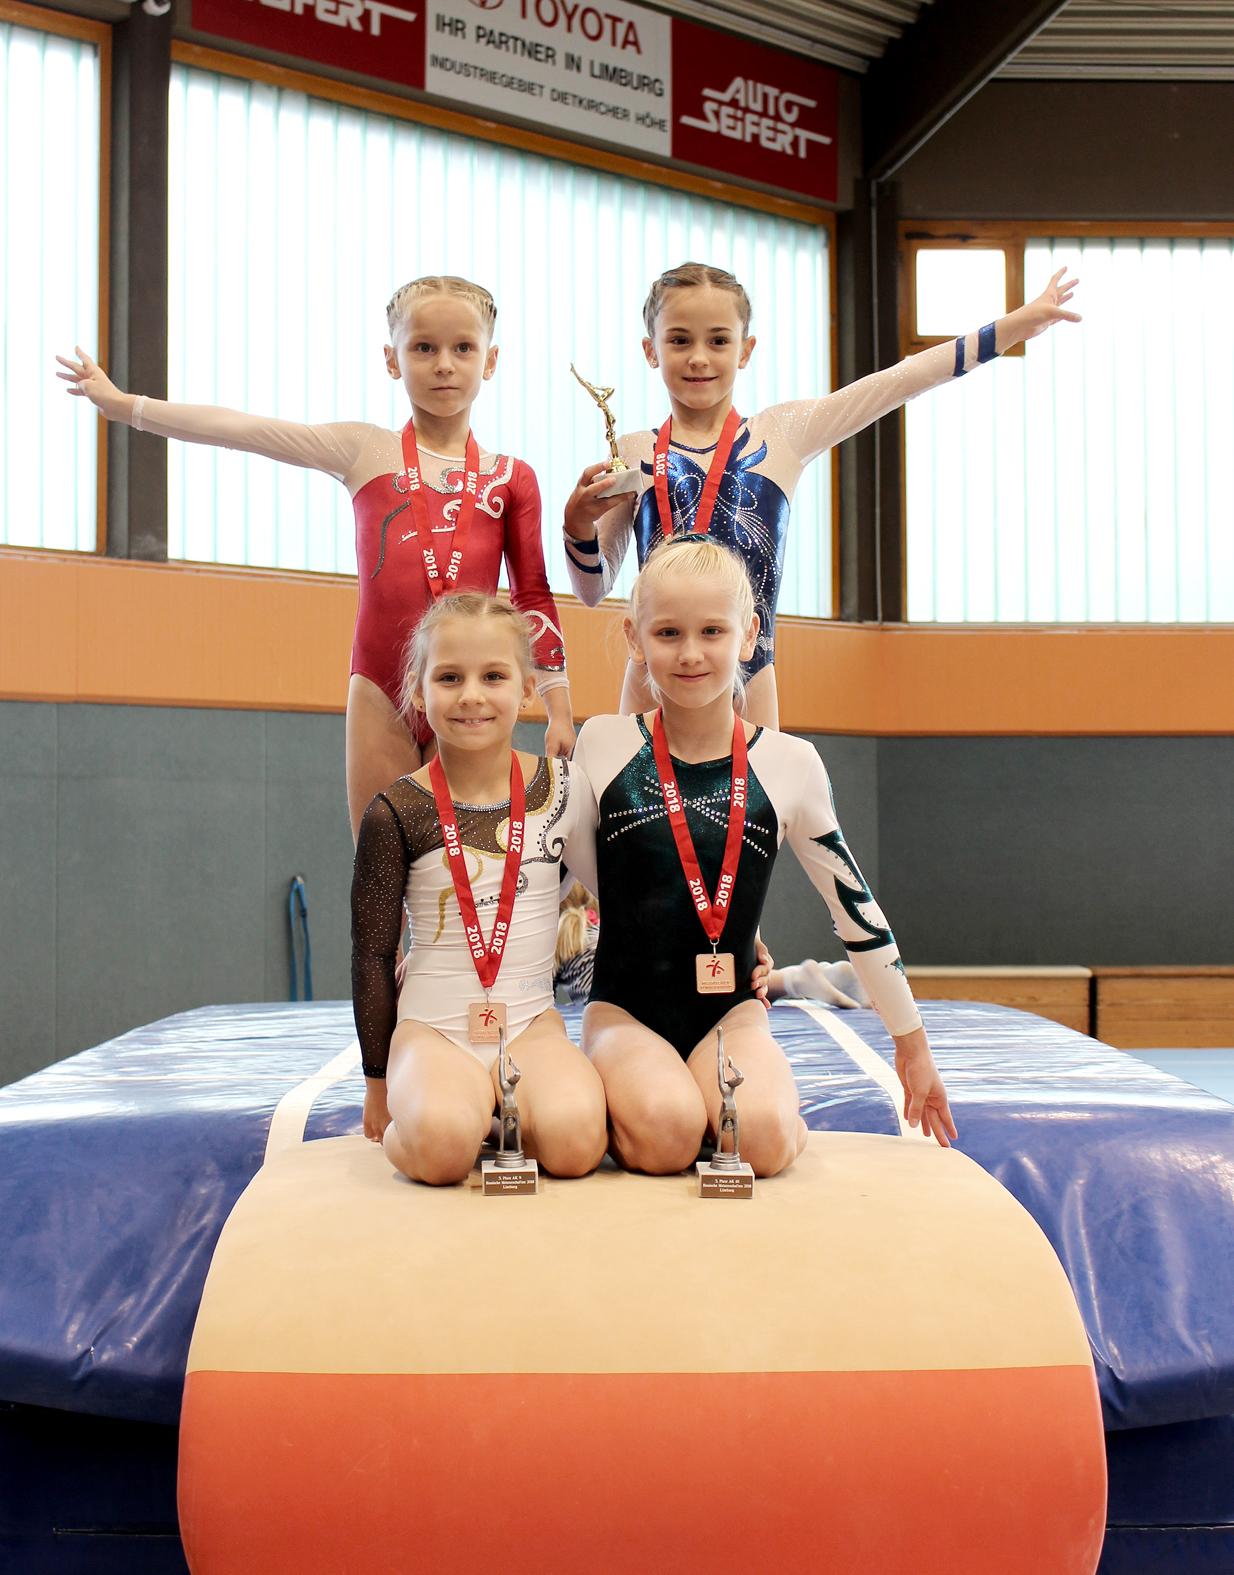 oben von links nach rechts: Svetlana Levitsky AK 8, Marla Leugner-Vilela AK 8 unten von links nach rechts: Anna Belyakova-Zagumennova AK 9, Alva Pedersen AK 10